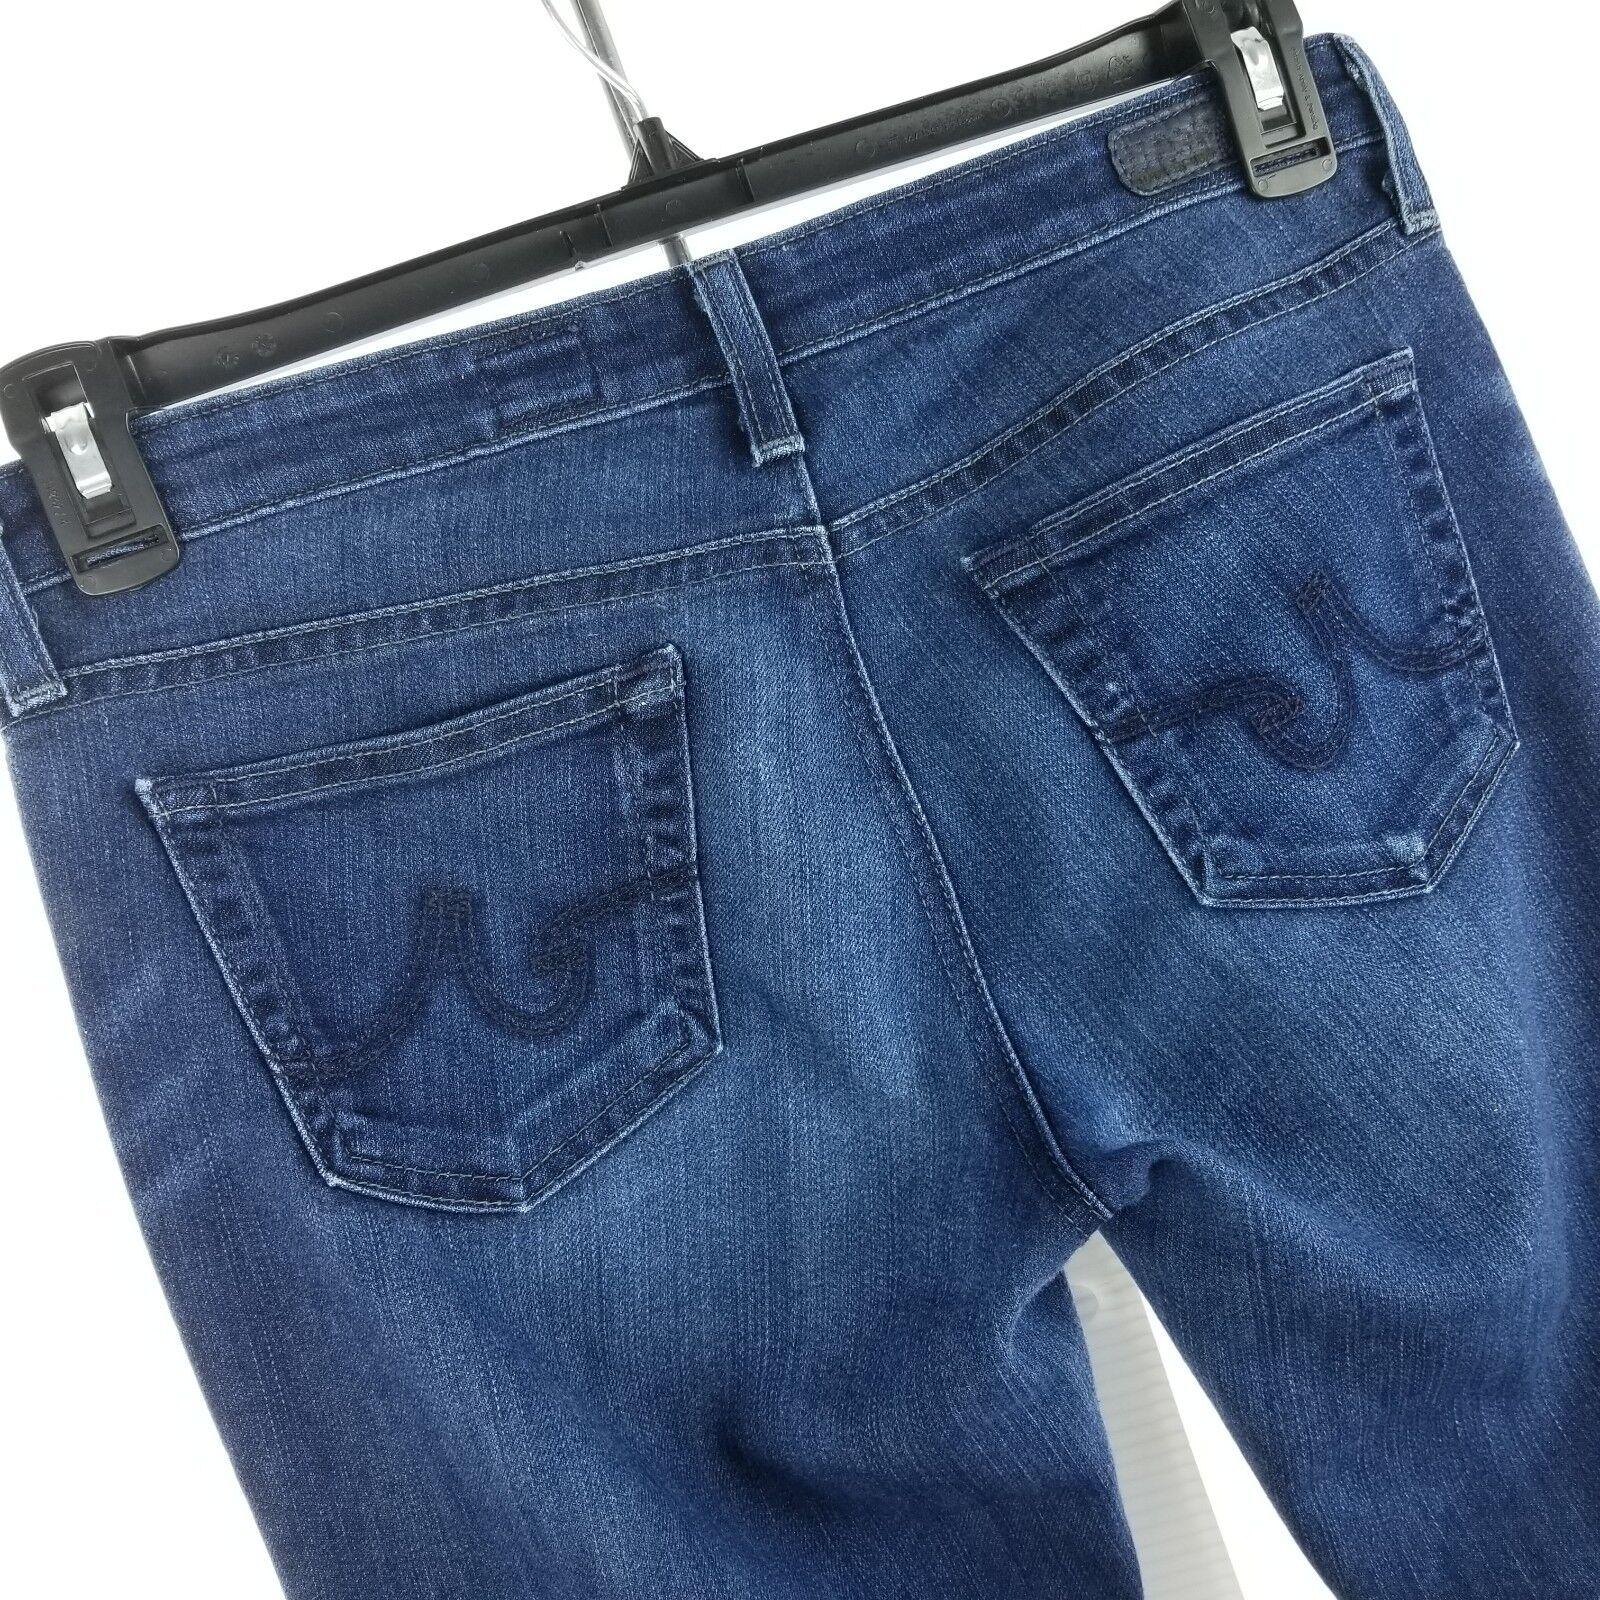 AG Adriano goldschmied Women Jeans Size 28 the Stilt Cigarette